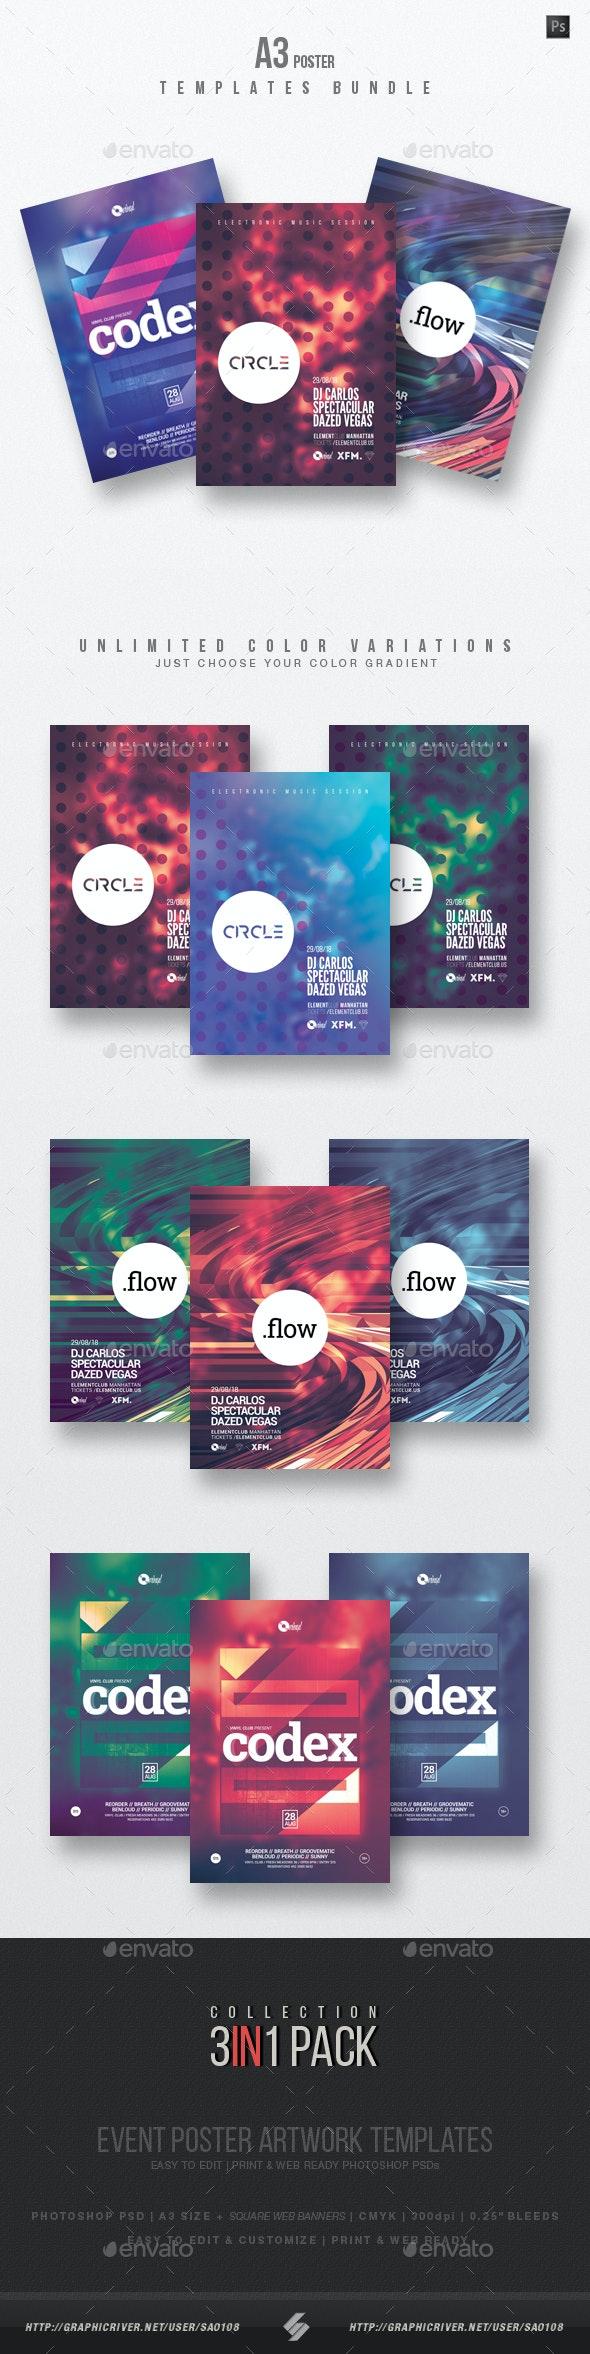 Minimal Sound vol.9 - Club Party Flyer / Poster Templates Bundle - Clubs & Parties Events